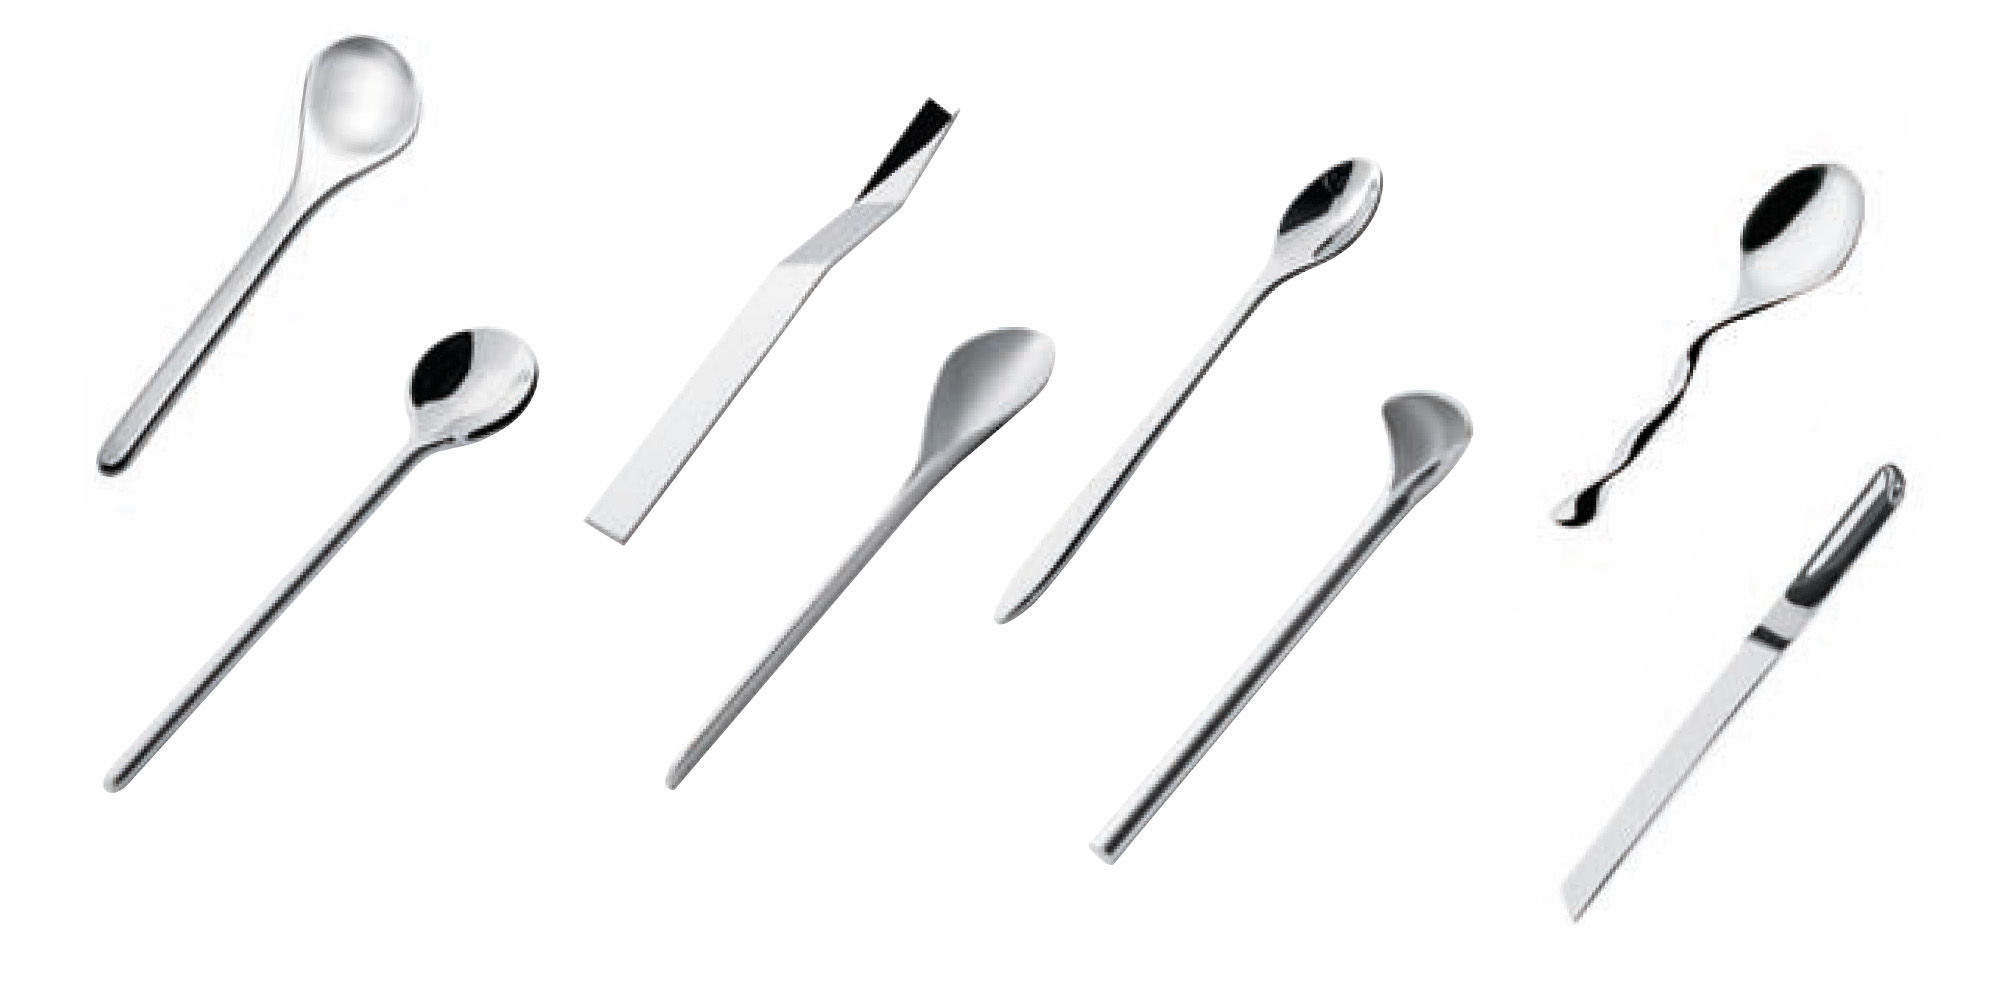 Tischkultur - Bestecke - Il caffè/tè Kaffeelöffel 8-er Set - Alessi - Edelstahl glänzend - polierter rostfreier Stahl